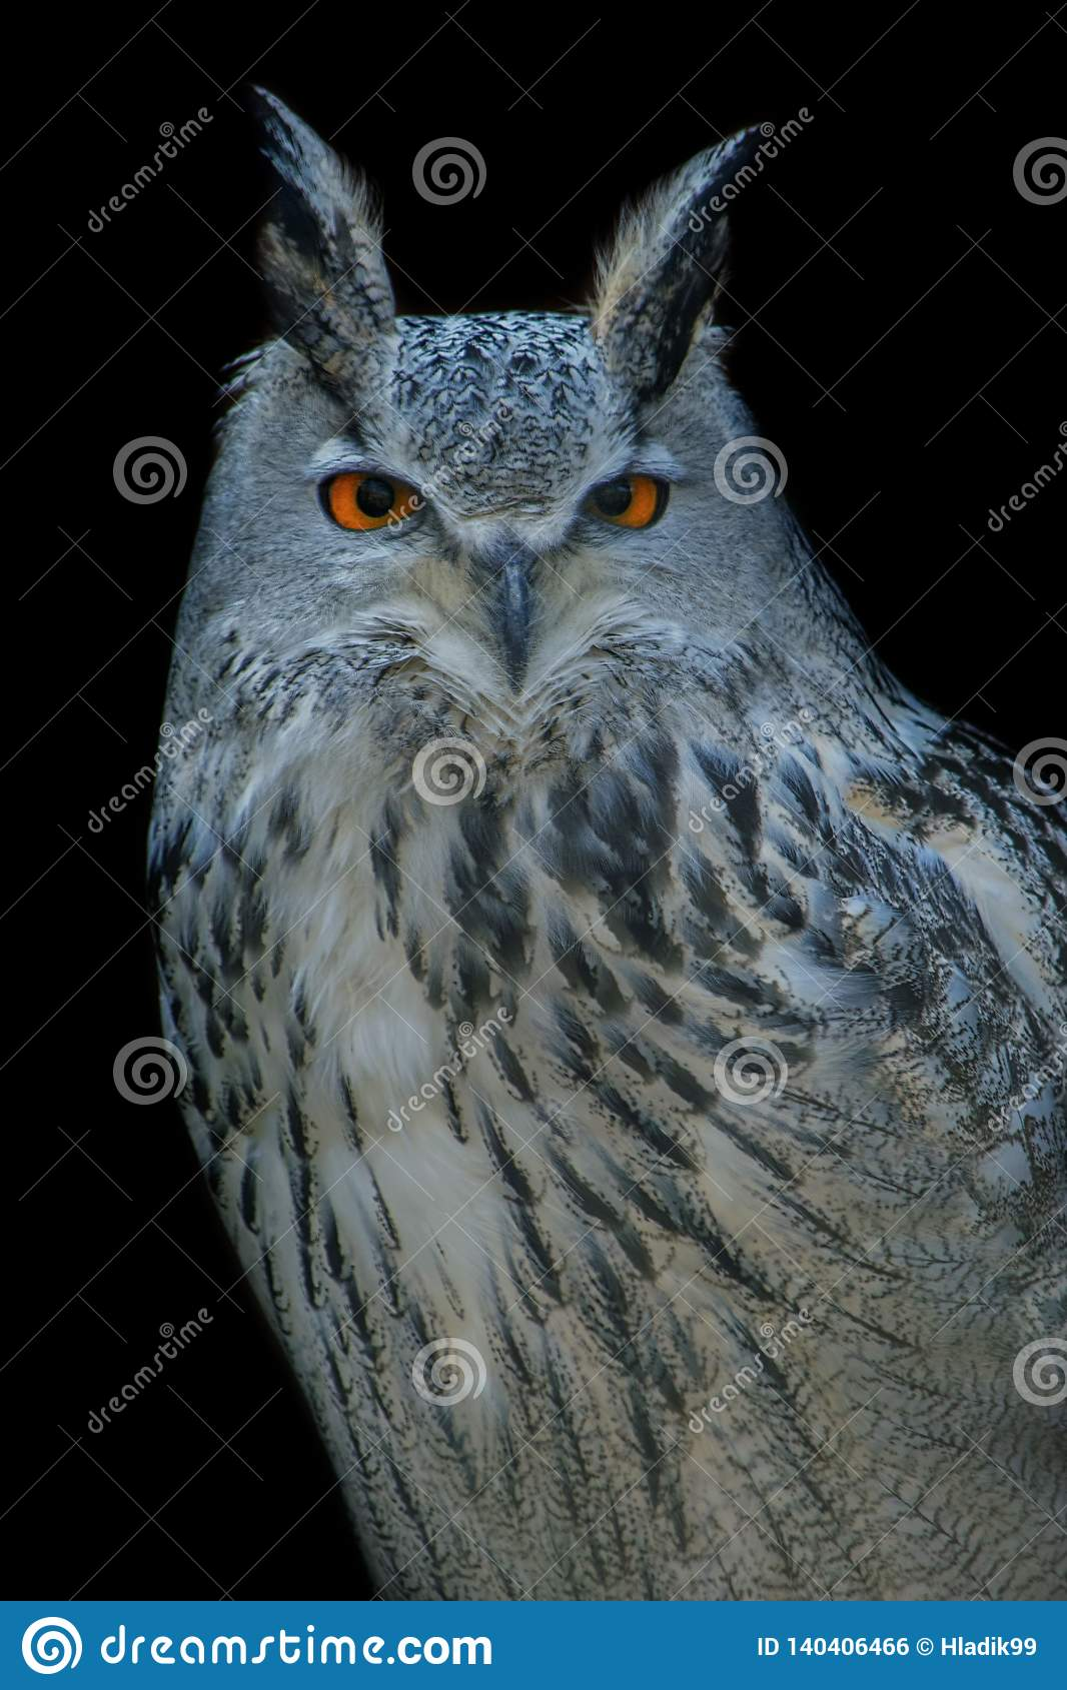 Eurasian eagle-owl, bird, black, eye, portrait